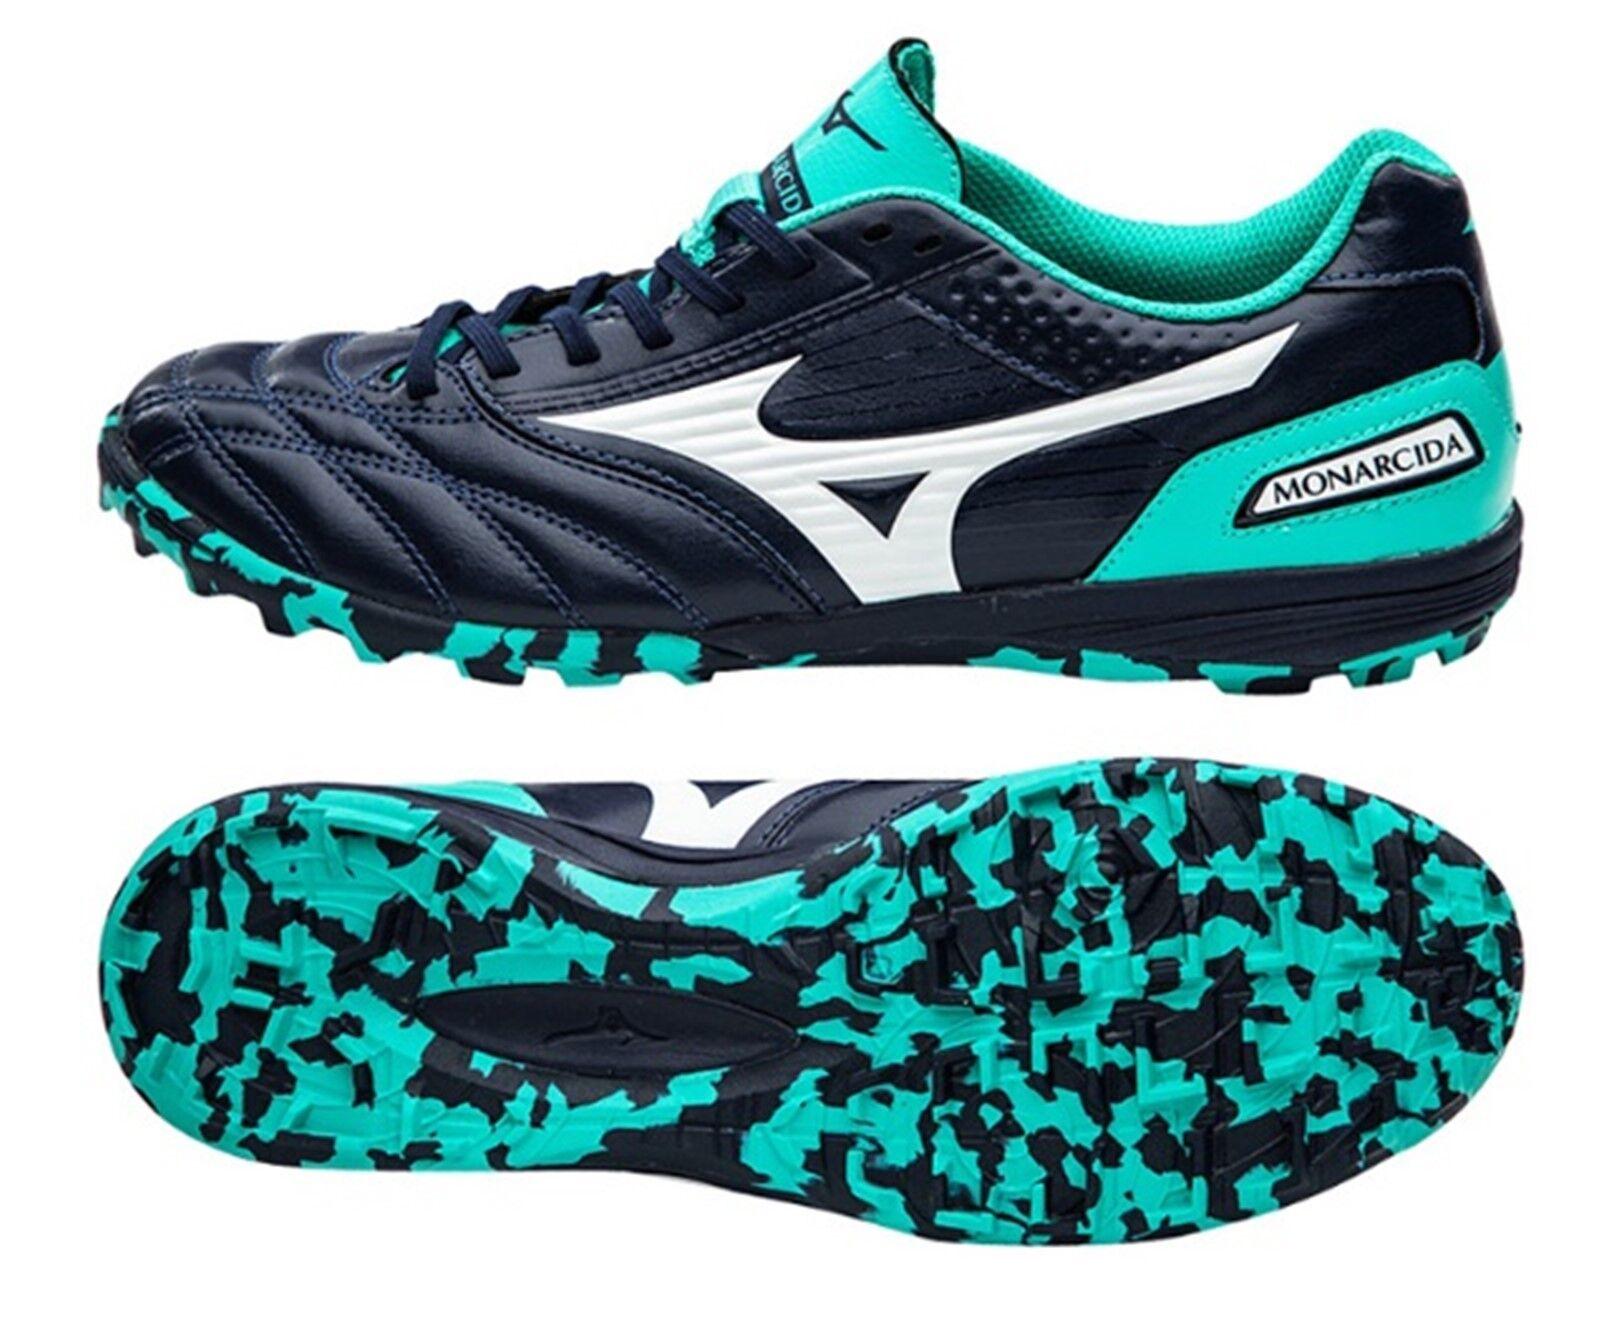 Mizuno Hombre Botines De HORQUILLA roscada monarcida Zapatos De Futsal Fútbol Azul Marino Bota Spike Q1GB181101